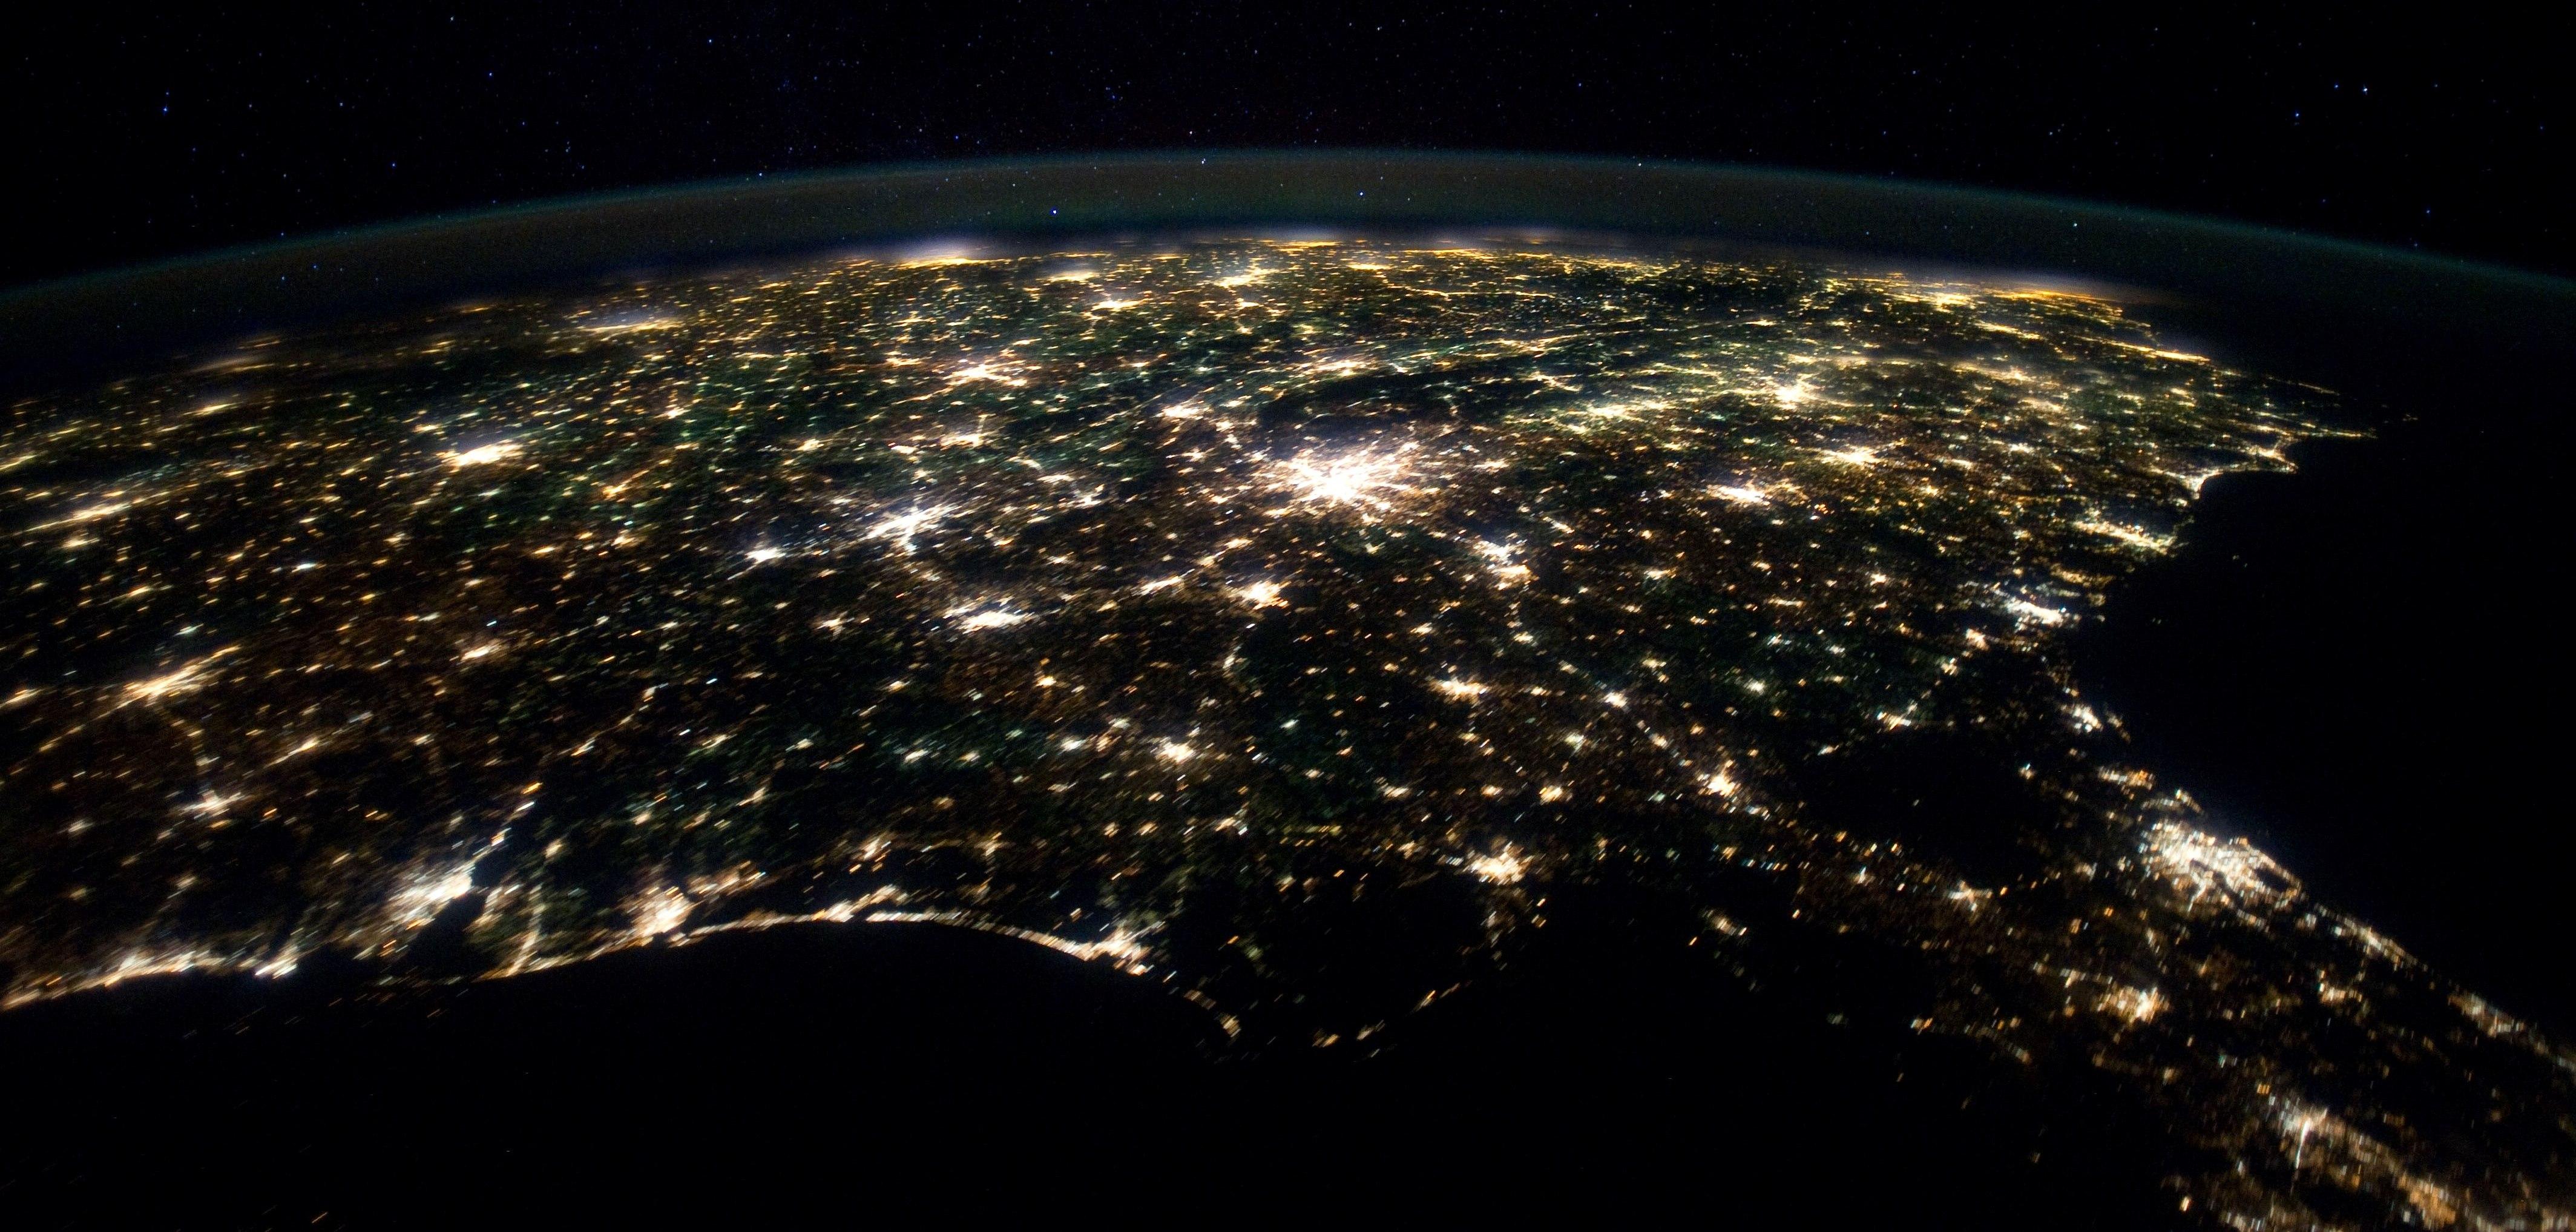 Earthrise NASA - Satellite map of se us at night